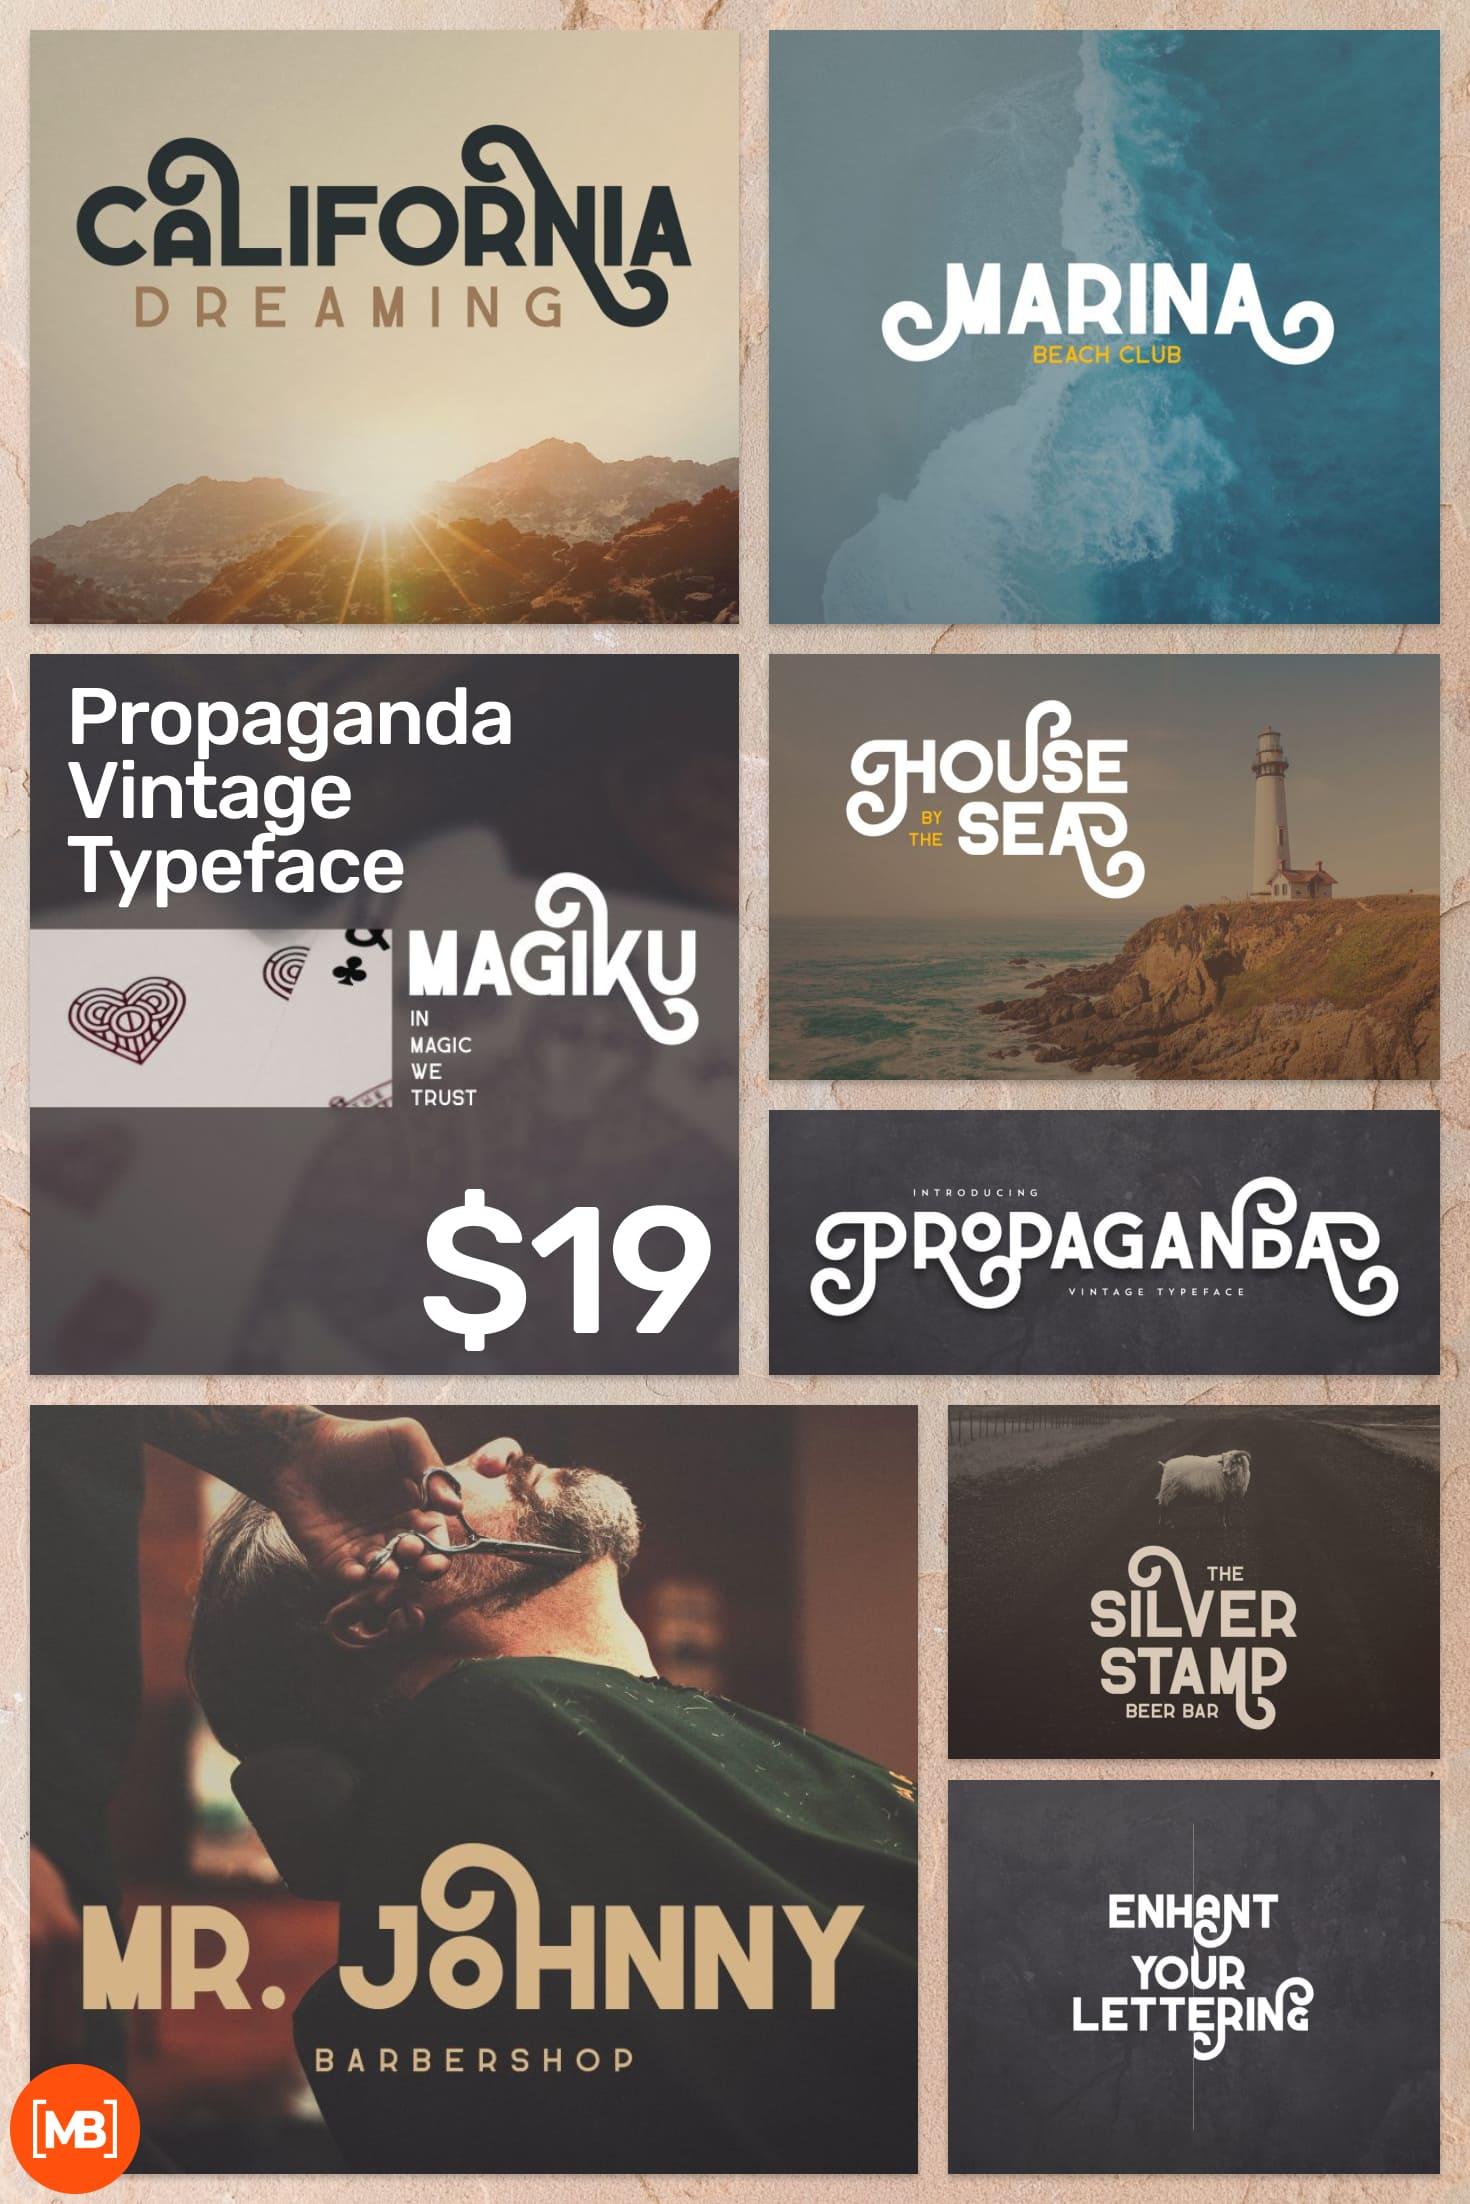 Pinterest Image: Propaganda Vintage Typeface - $19.